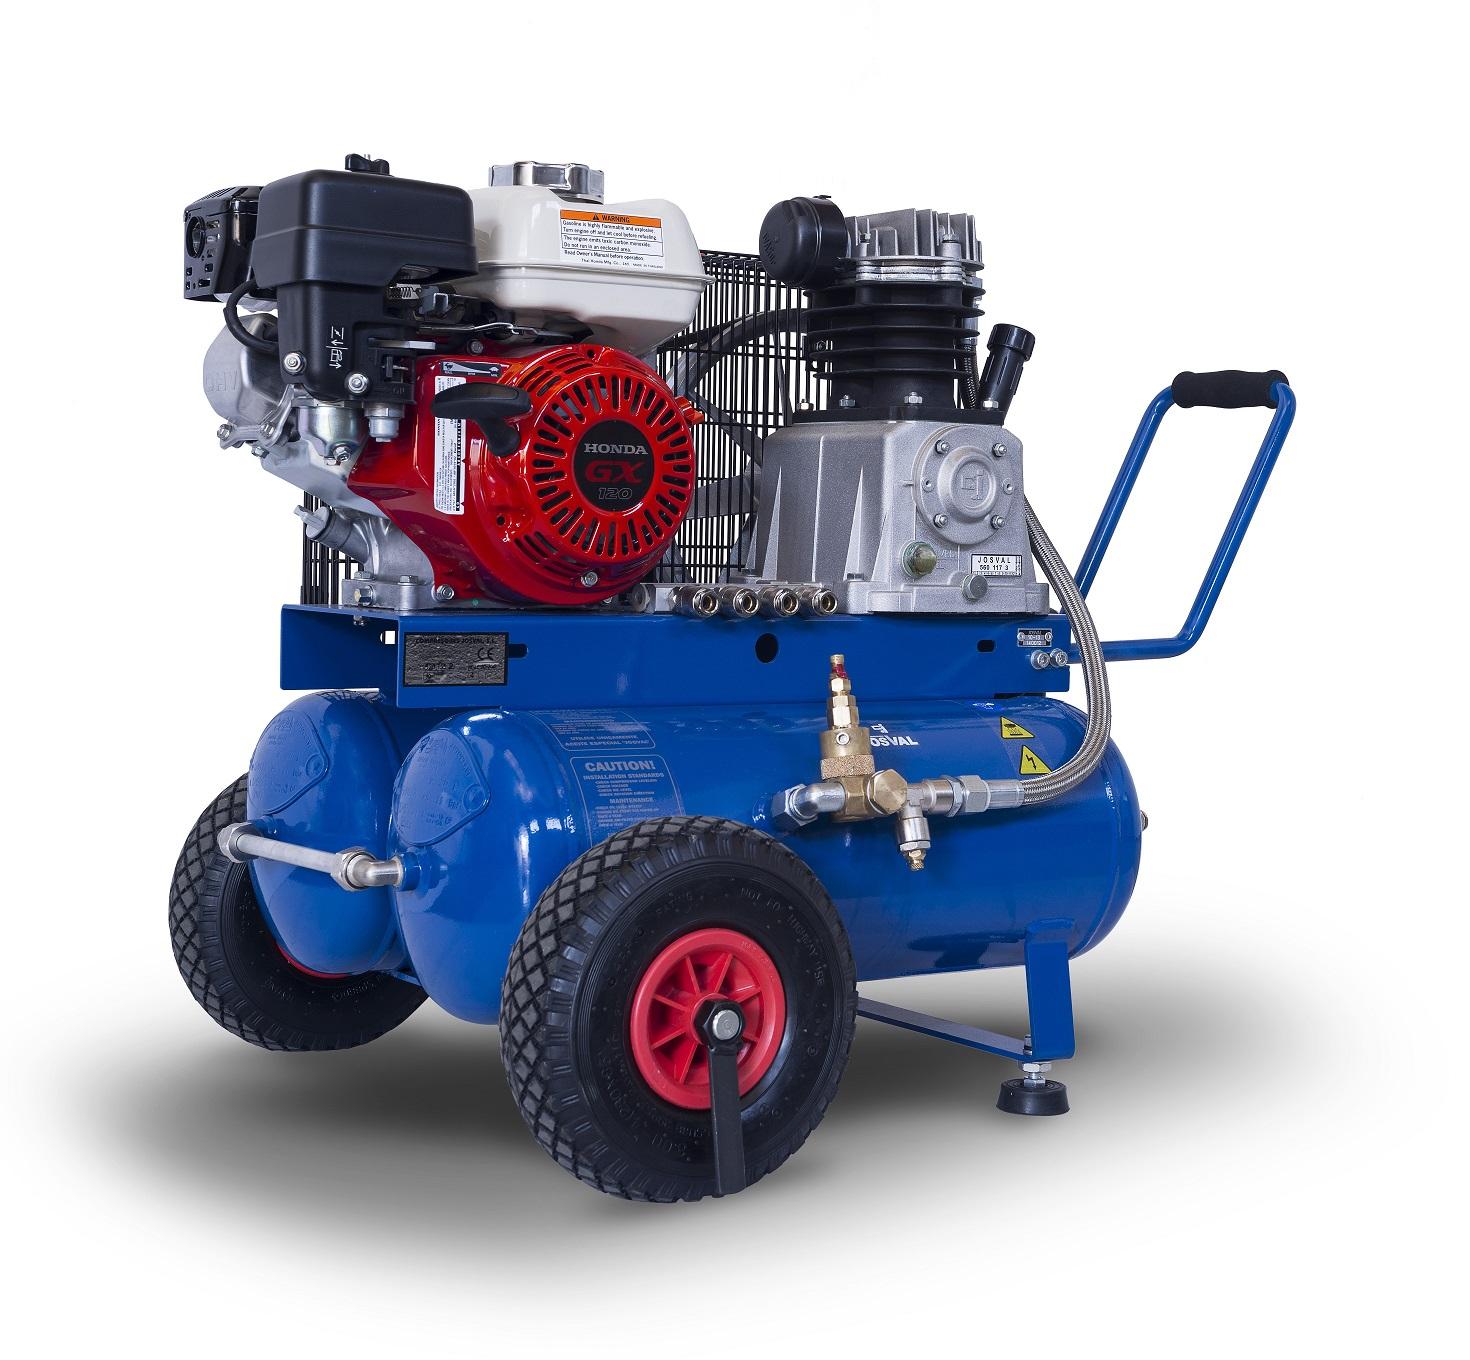 Kompresor spalinowy silnik benzynowy HONDA - MOTOR - MC-LE-25G (25L, 10BAR, 4KM) JOSVAL